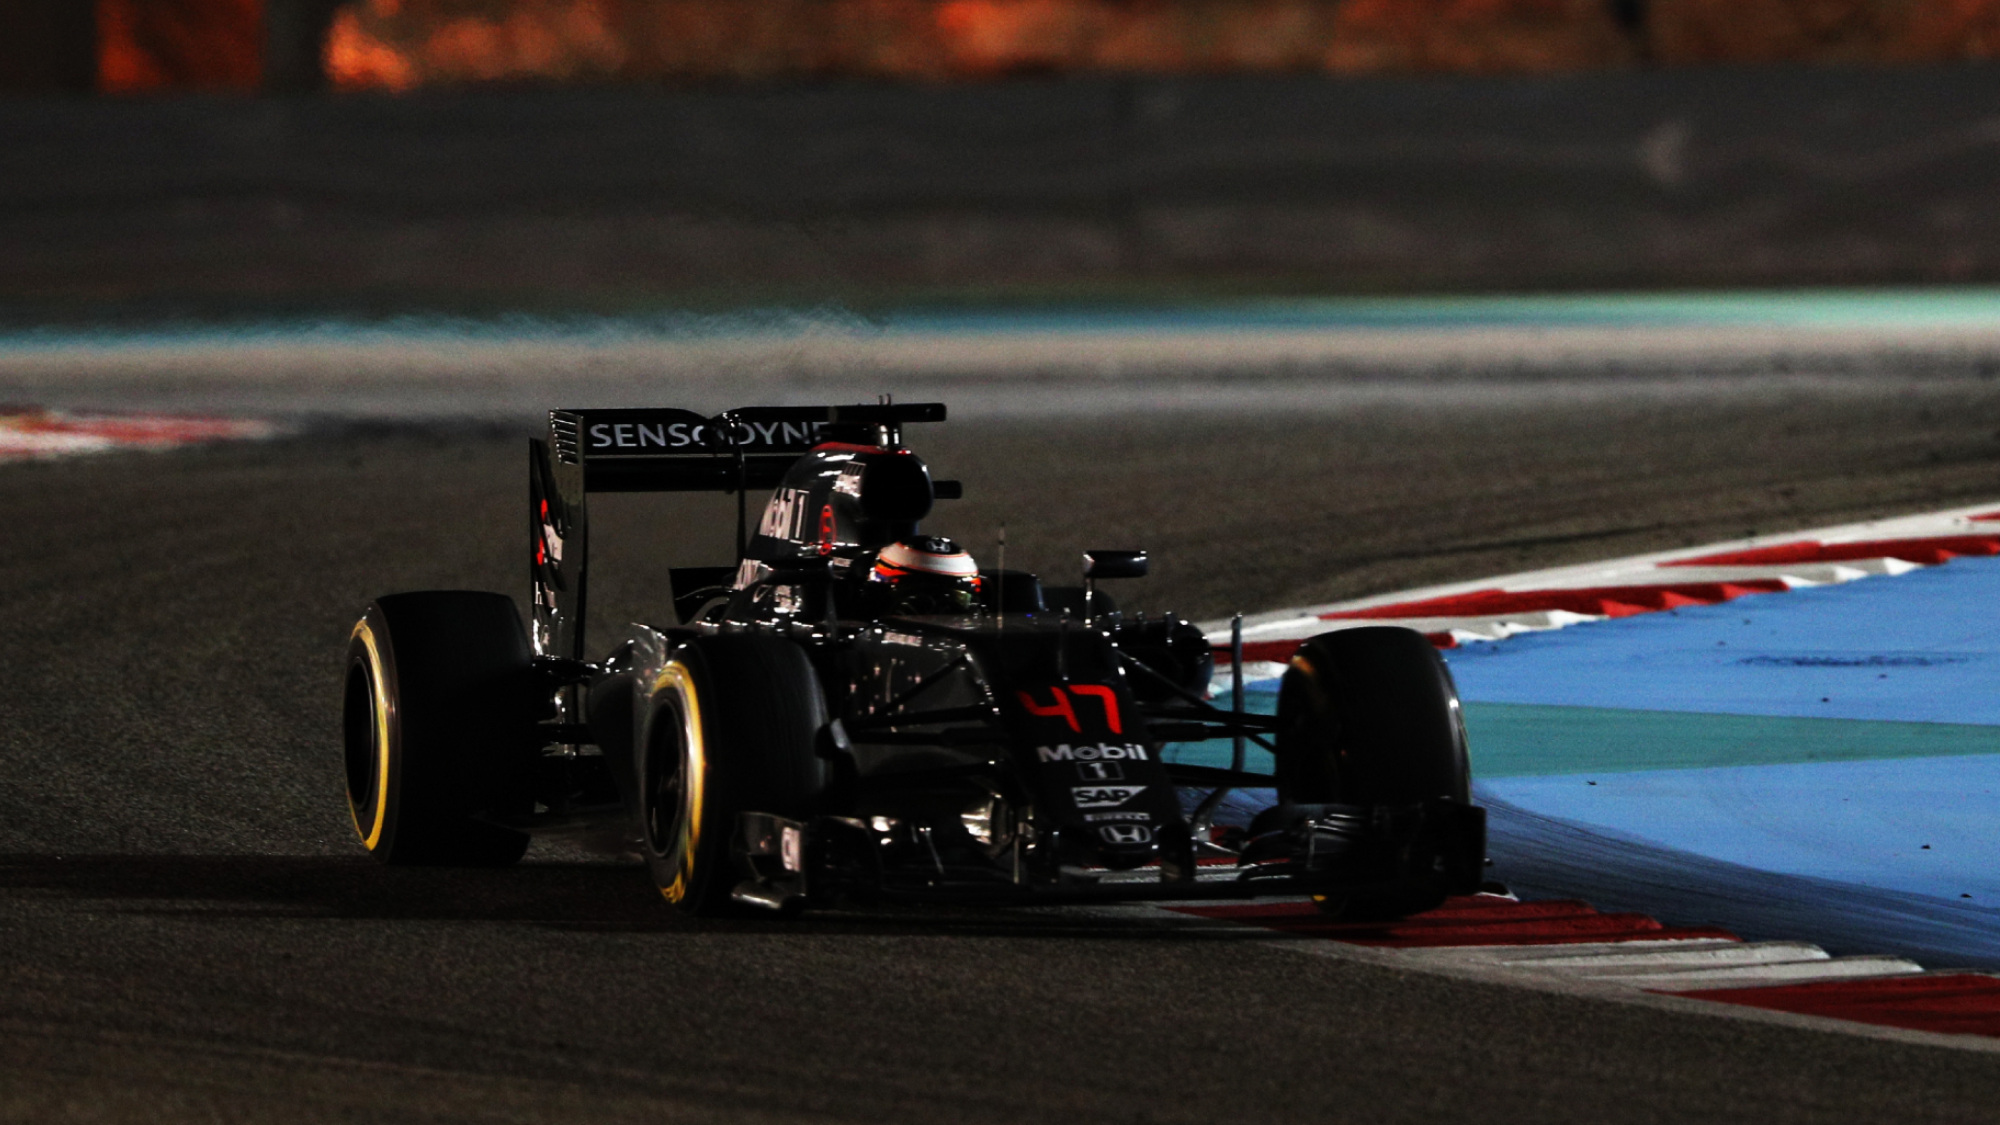 Stoffel Vandoorne, 2016 Bahrain GP